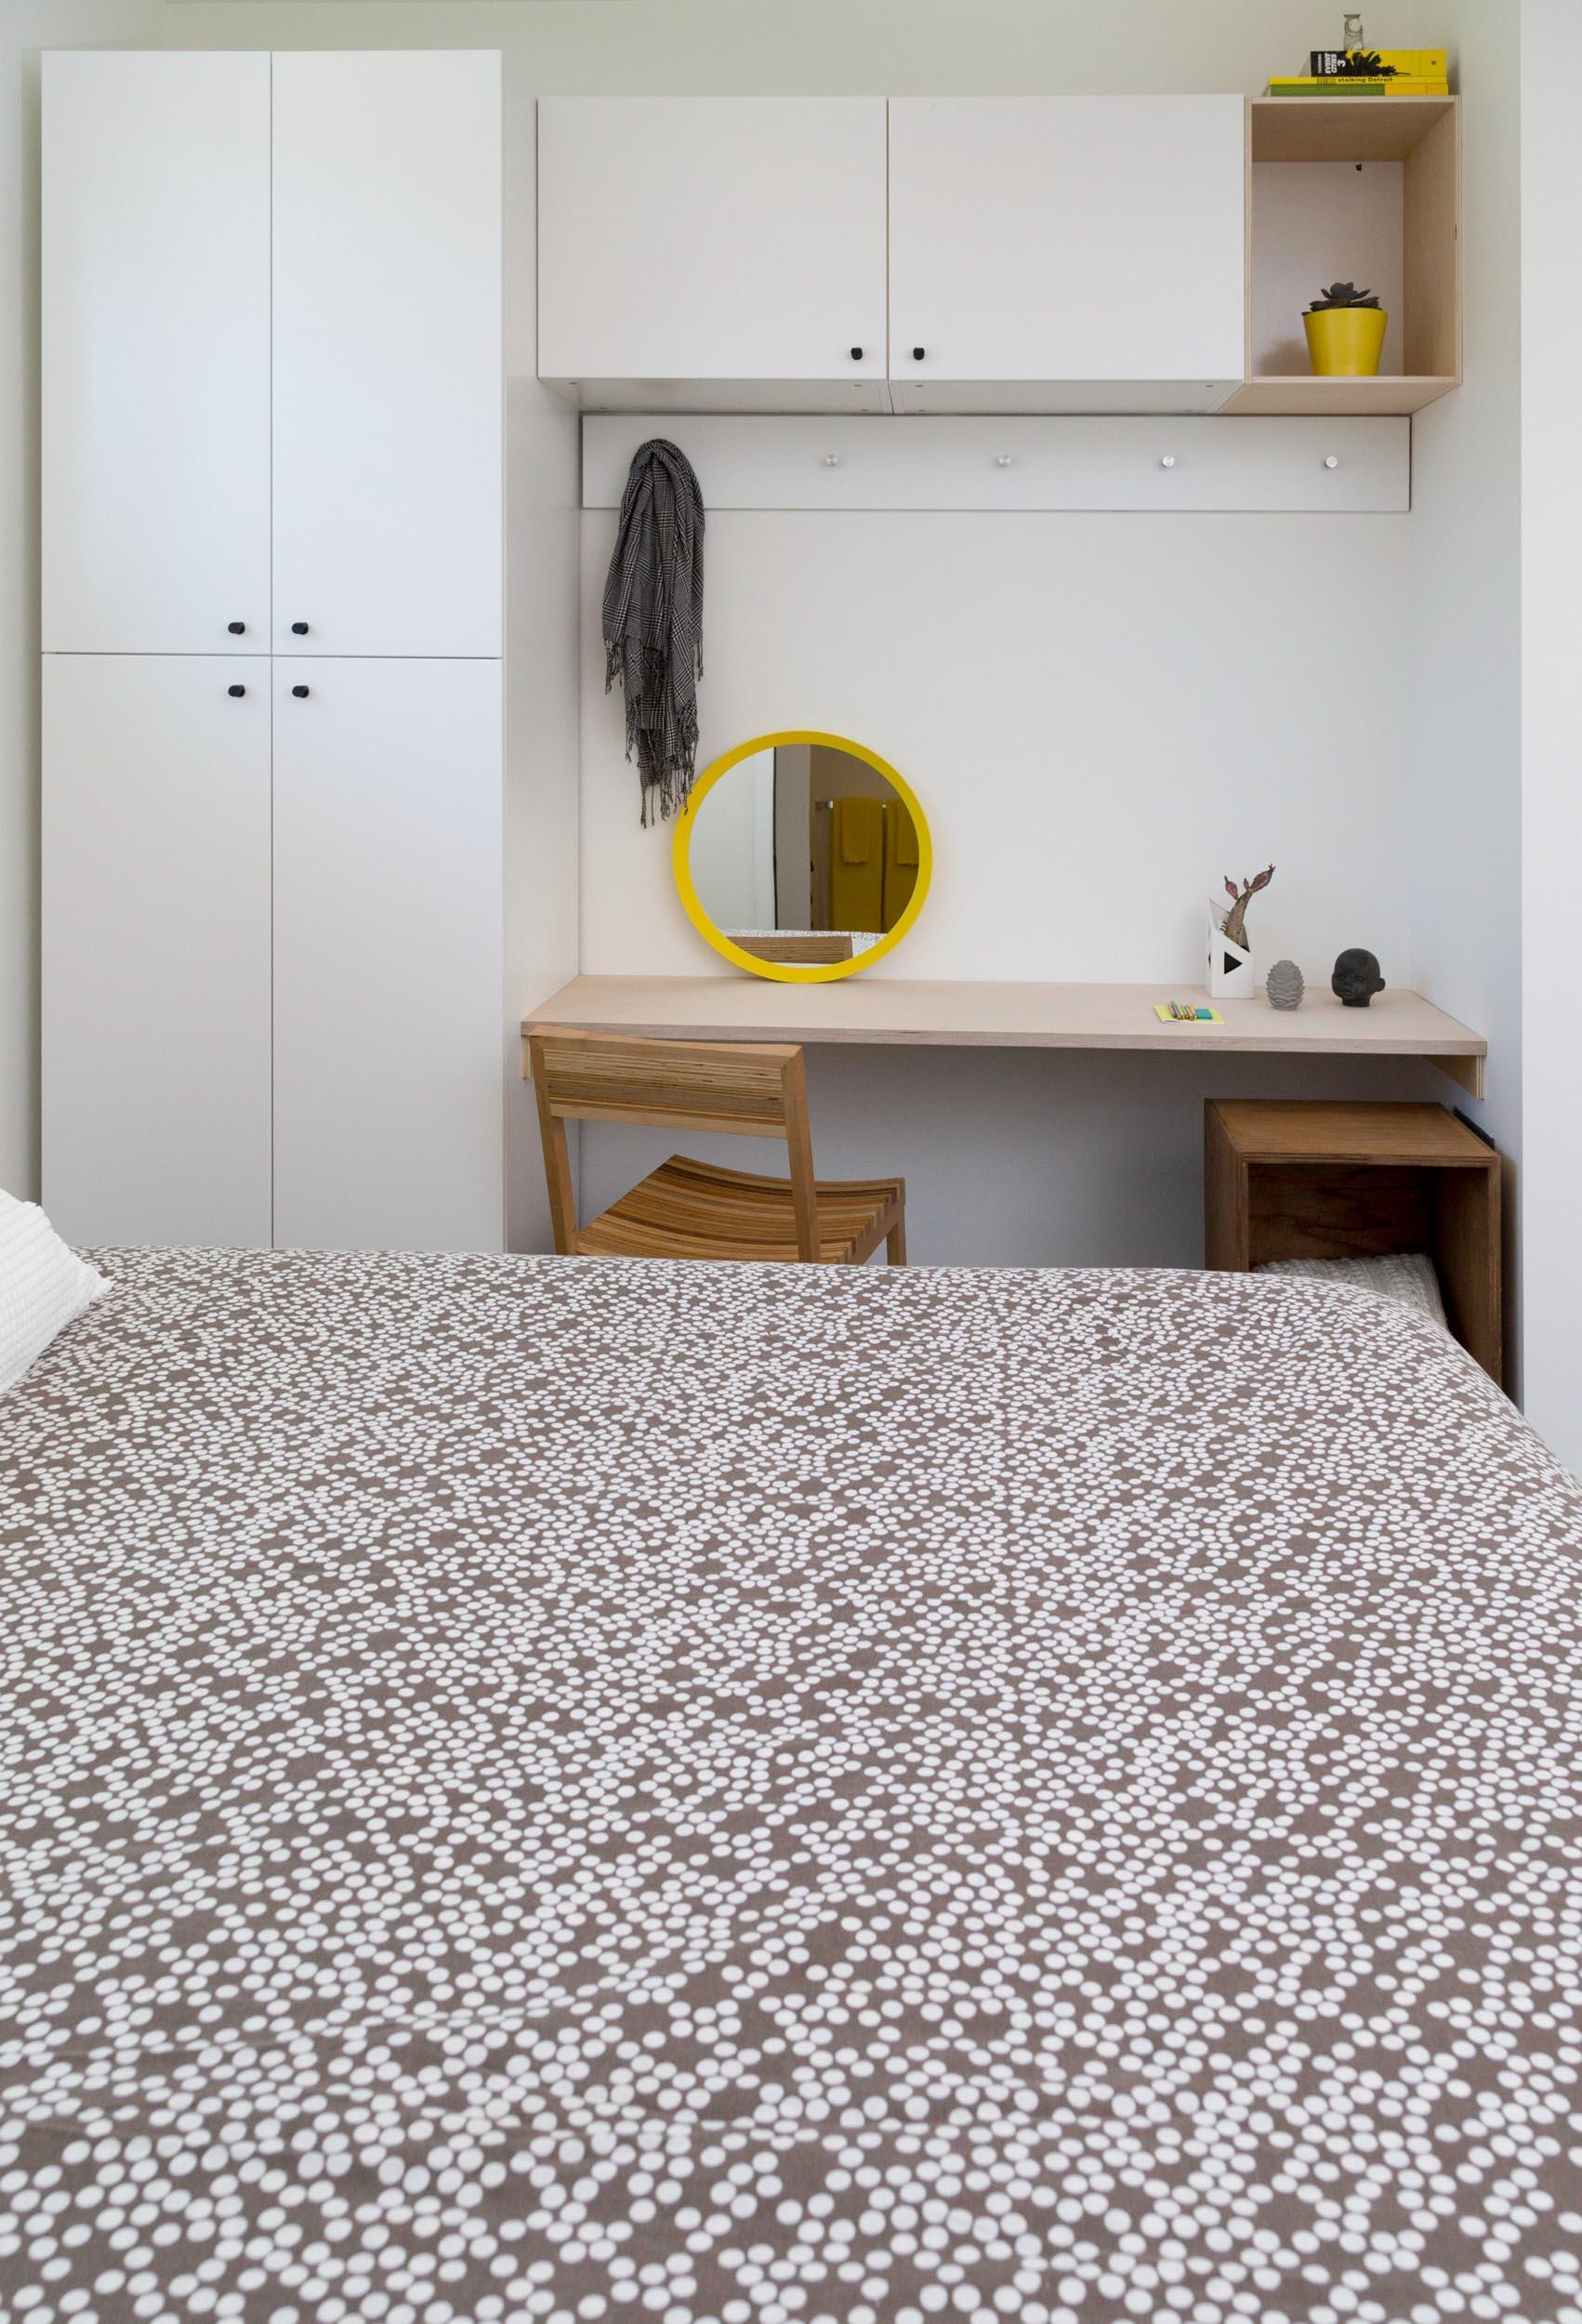 WC-STUDIO-PROSPECT-BEDROOM-BUILT-IN-DESK-WARDROBE-STORAGE.jpg